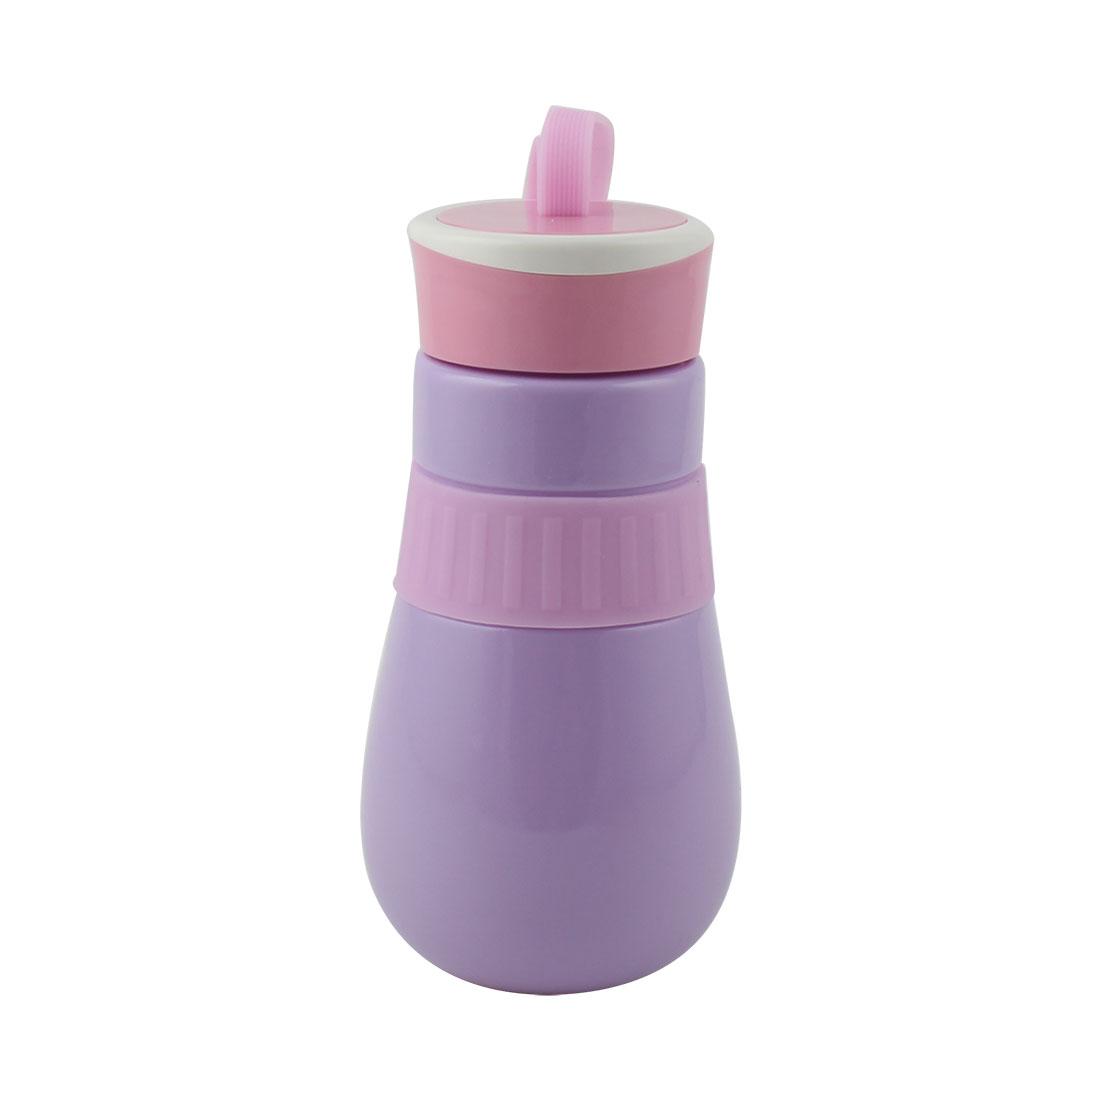 Student Travel Plastic Portable Water Tea Drinking Bottle Mug Sports Hiking Cup Purple 410ml